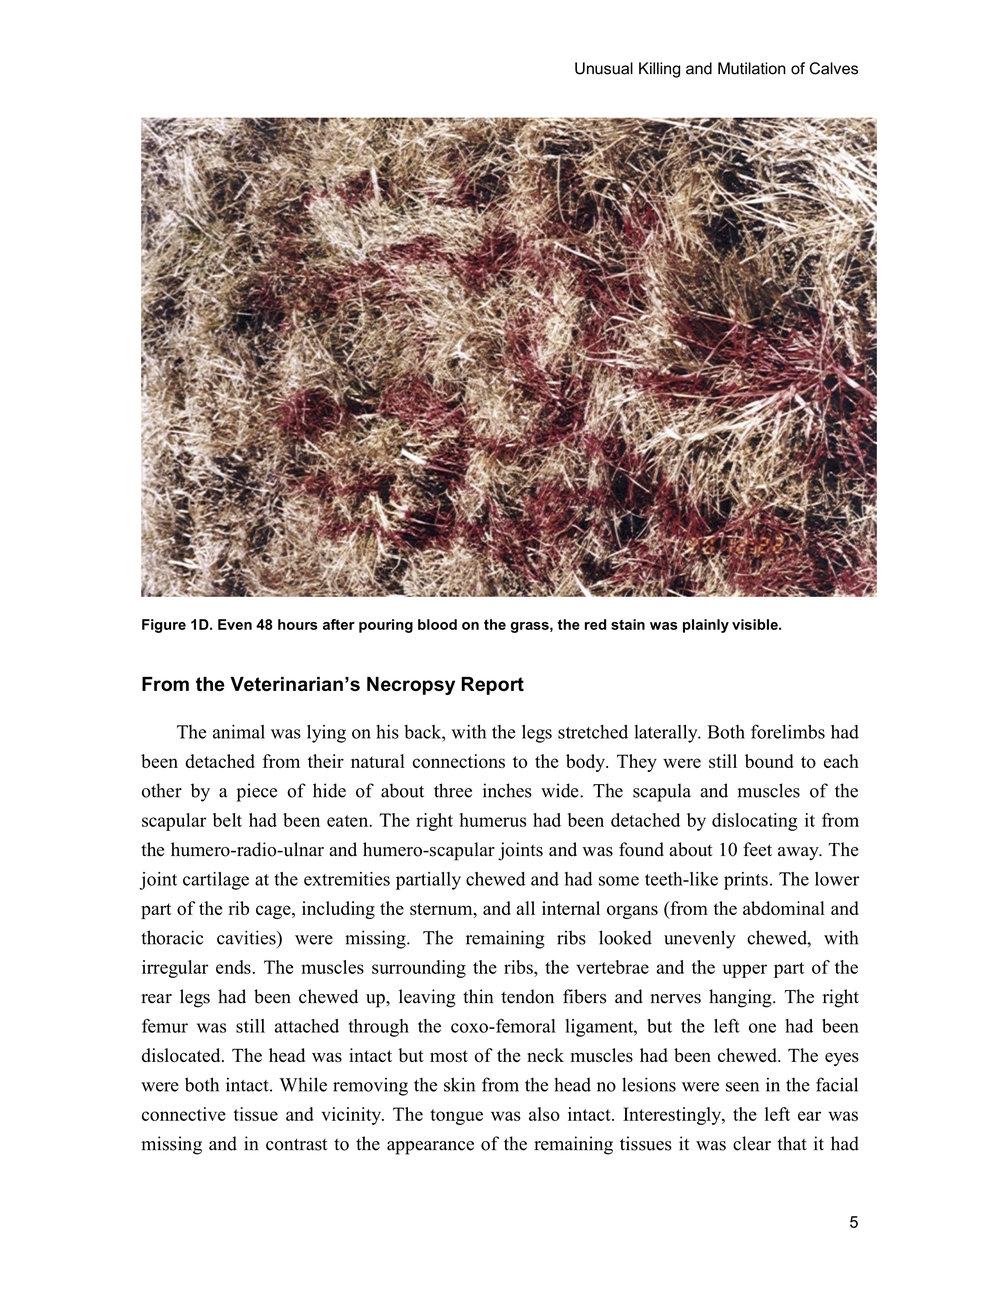 1997 ANIMAL MUTILATION REPORT 4.jpg